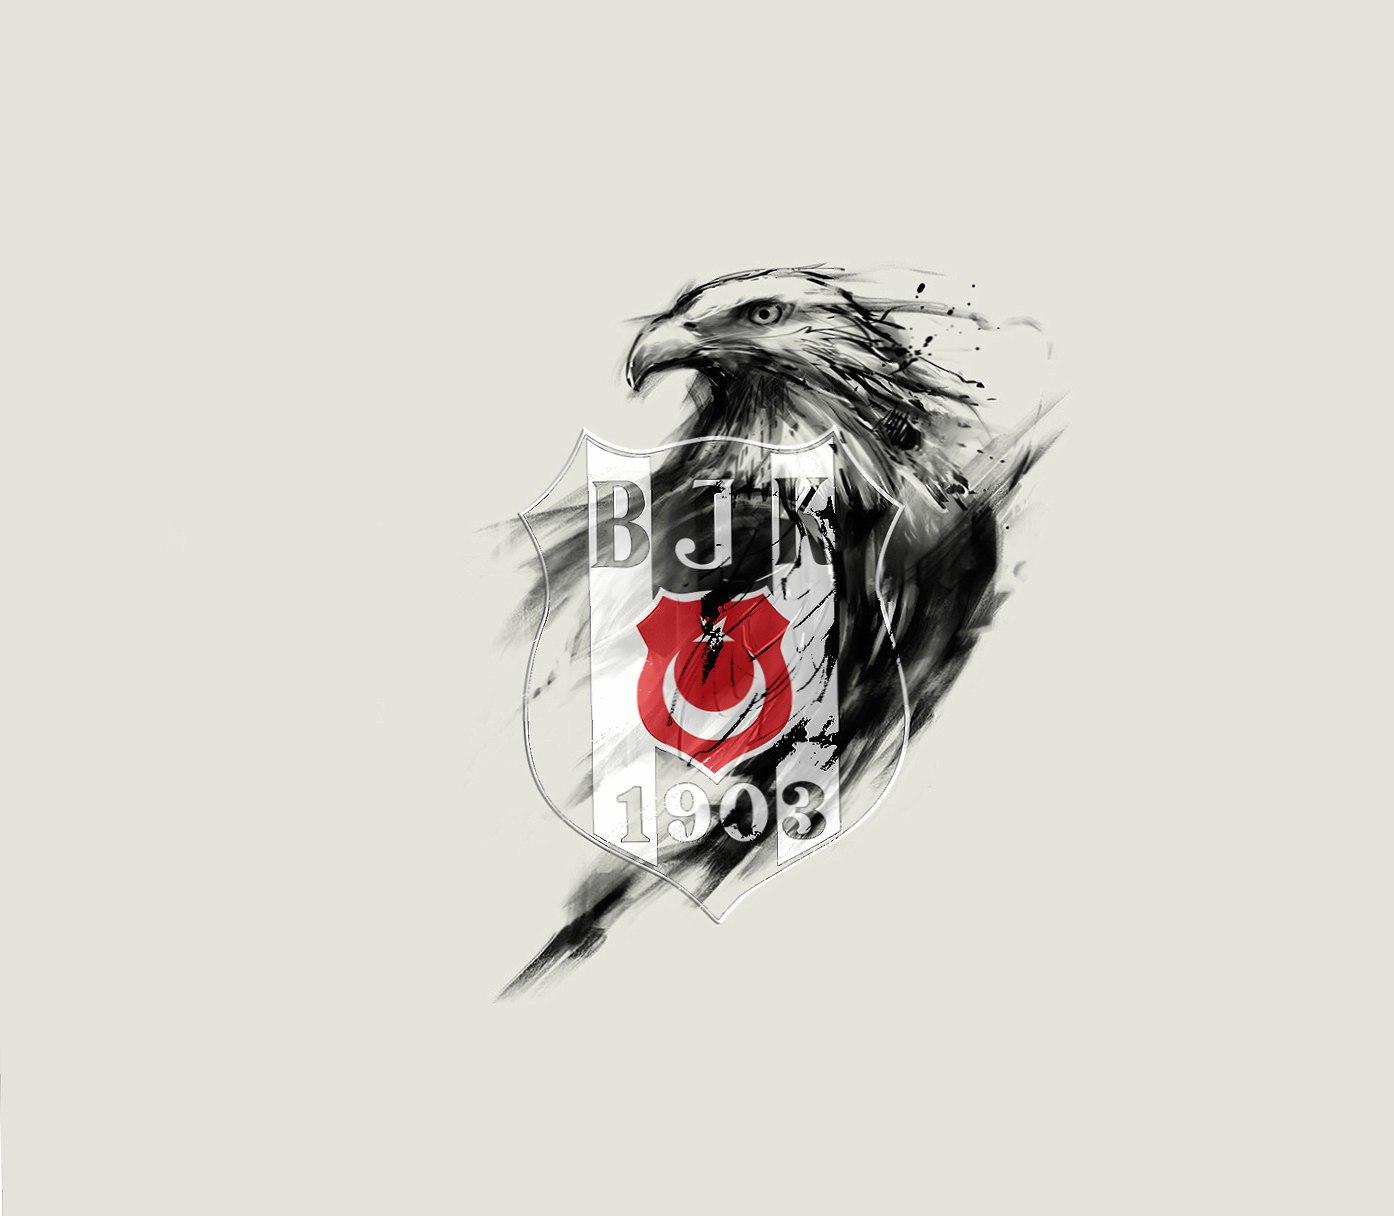 BJK - BESiKTAS JK wallpapers HD quality